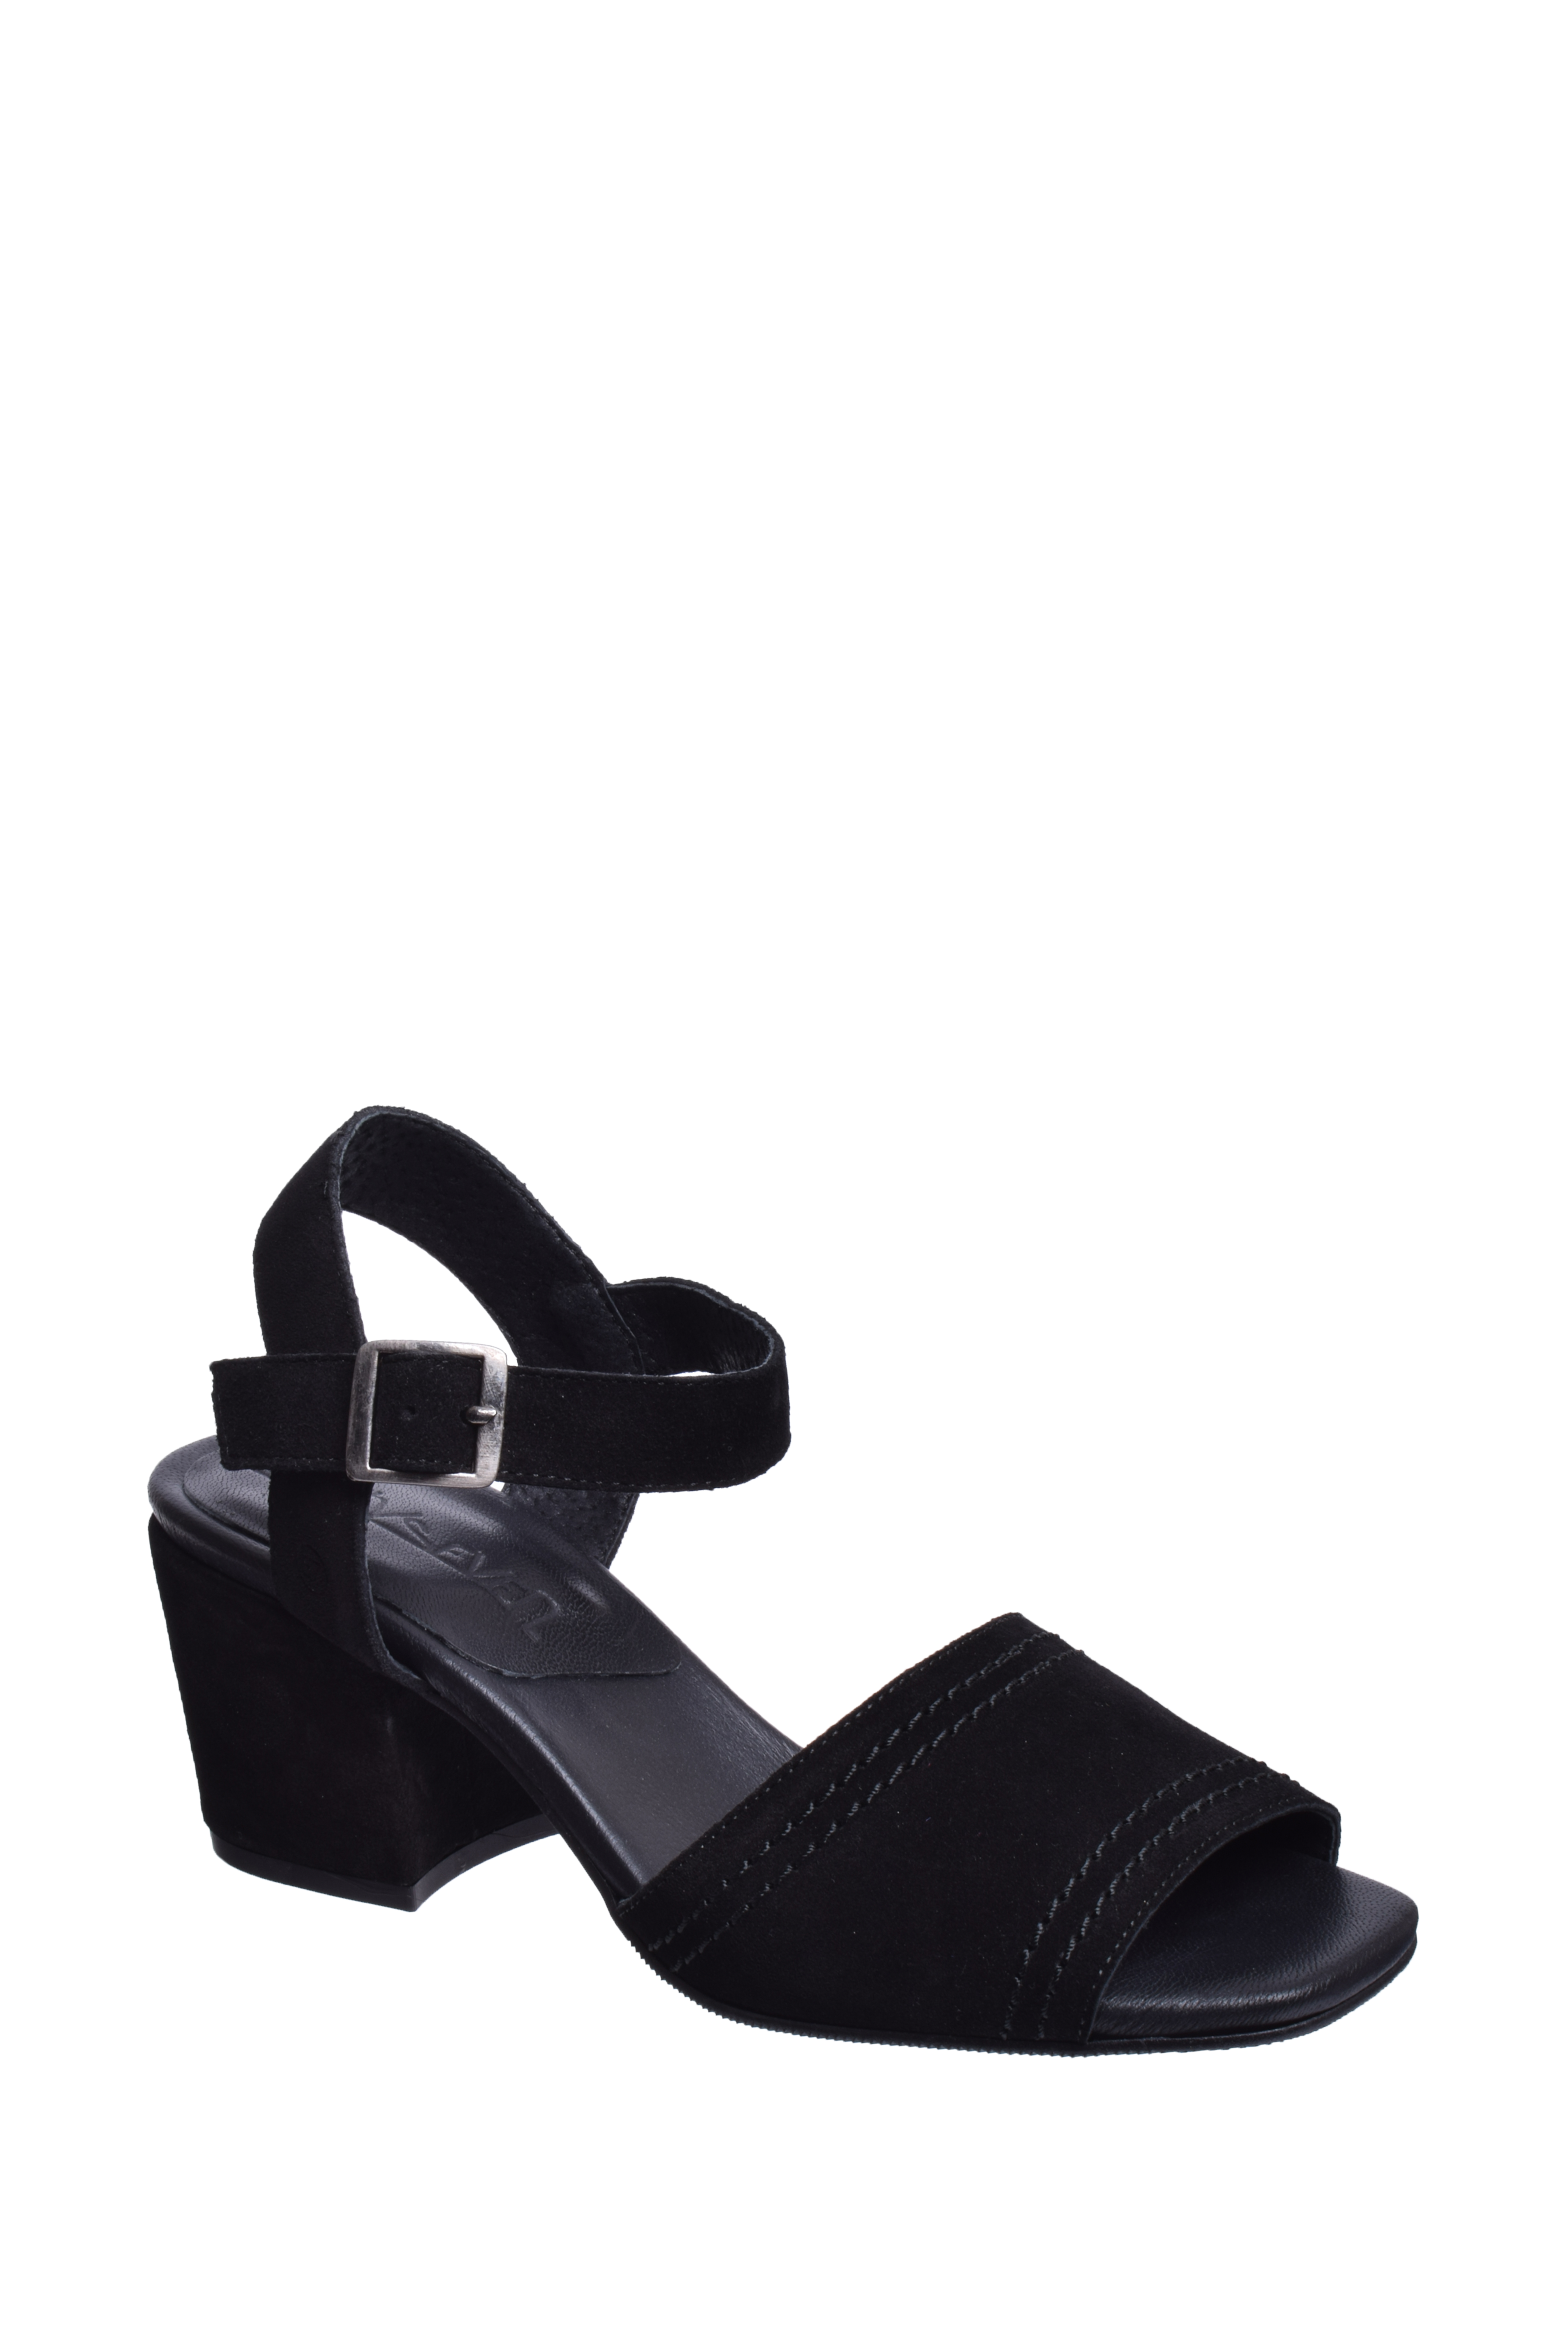 6d0f876e02 SixtySeven - SixtySeven Arif Mid Heel Sandal - Black Suede - Walmart.com